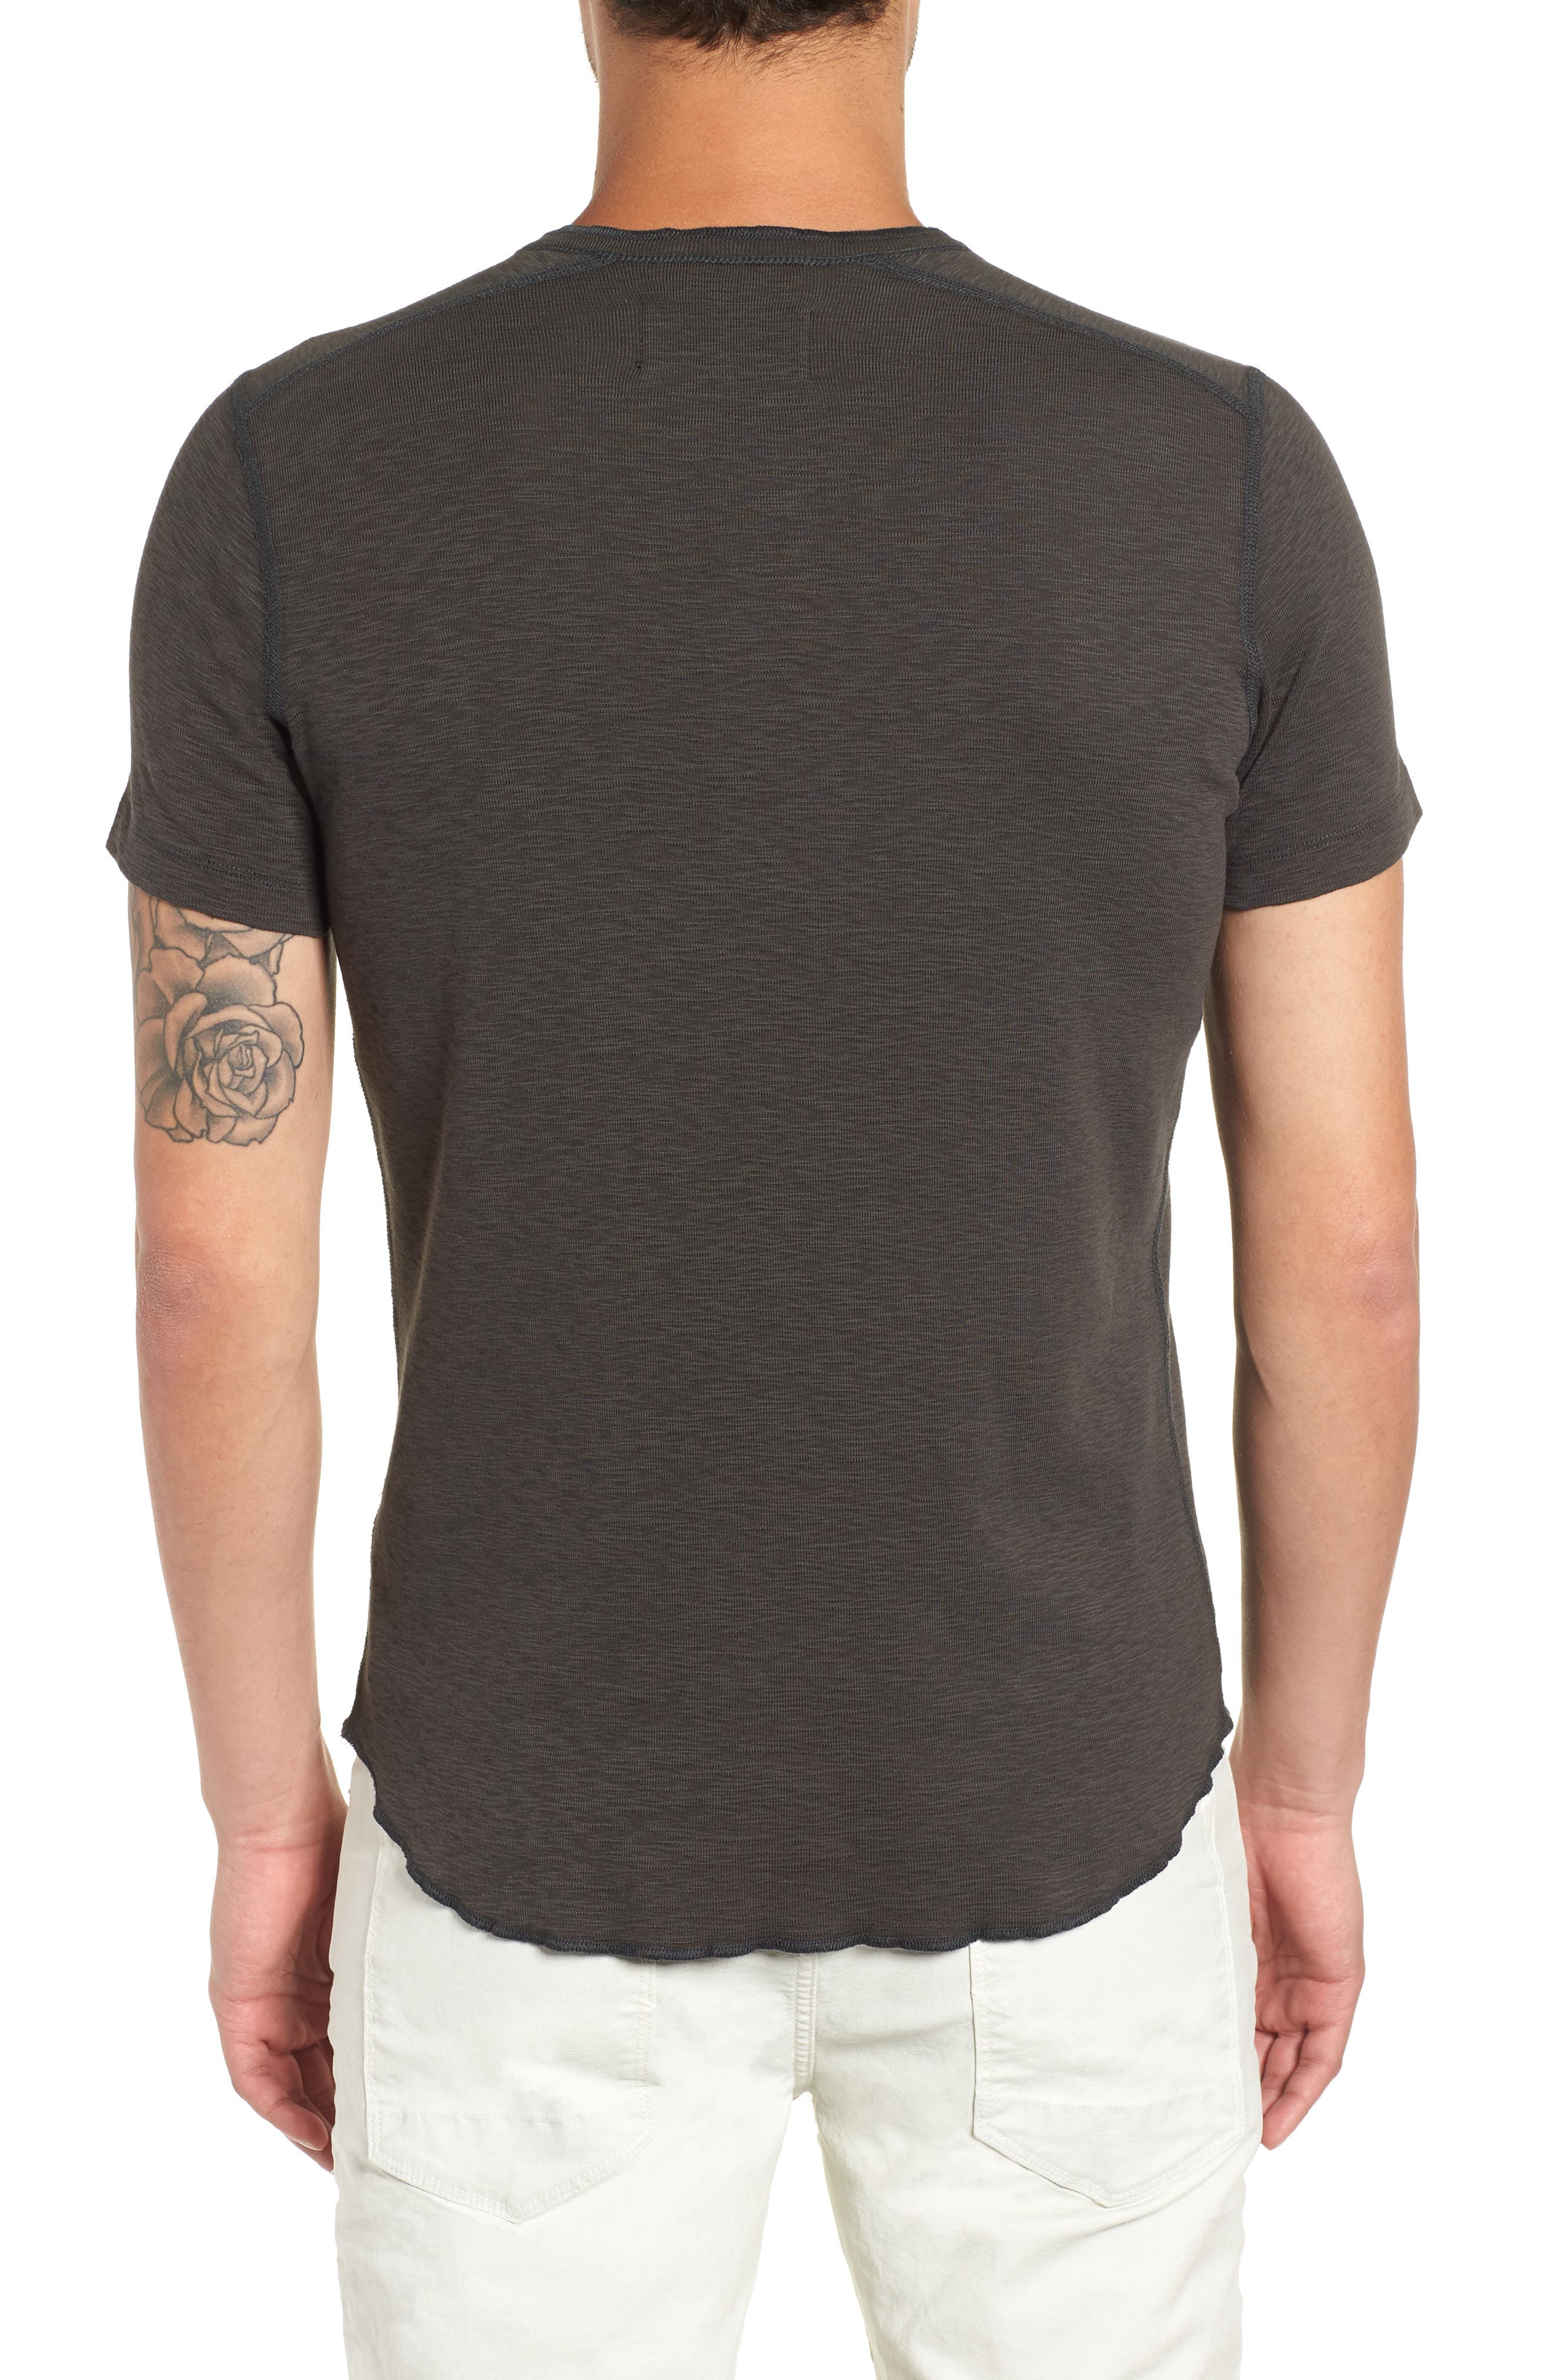 12b34a4fec3e8 Walls Workwear Pocket T Shirt Sleeveless - BCD Tofu House